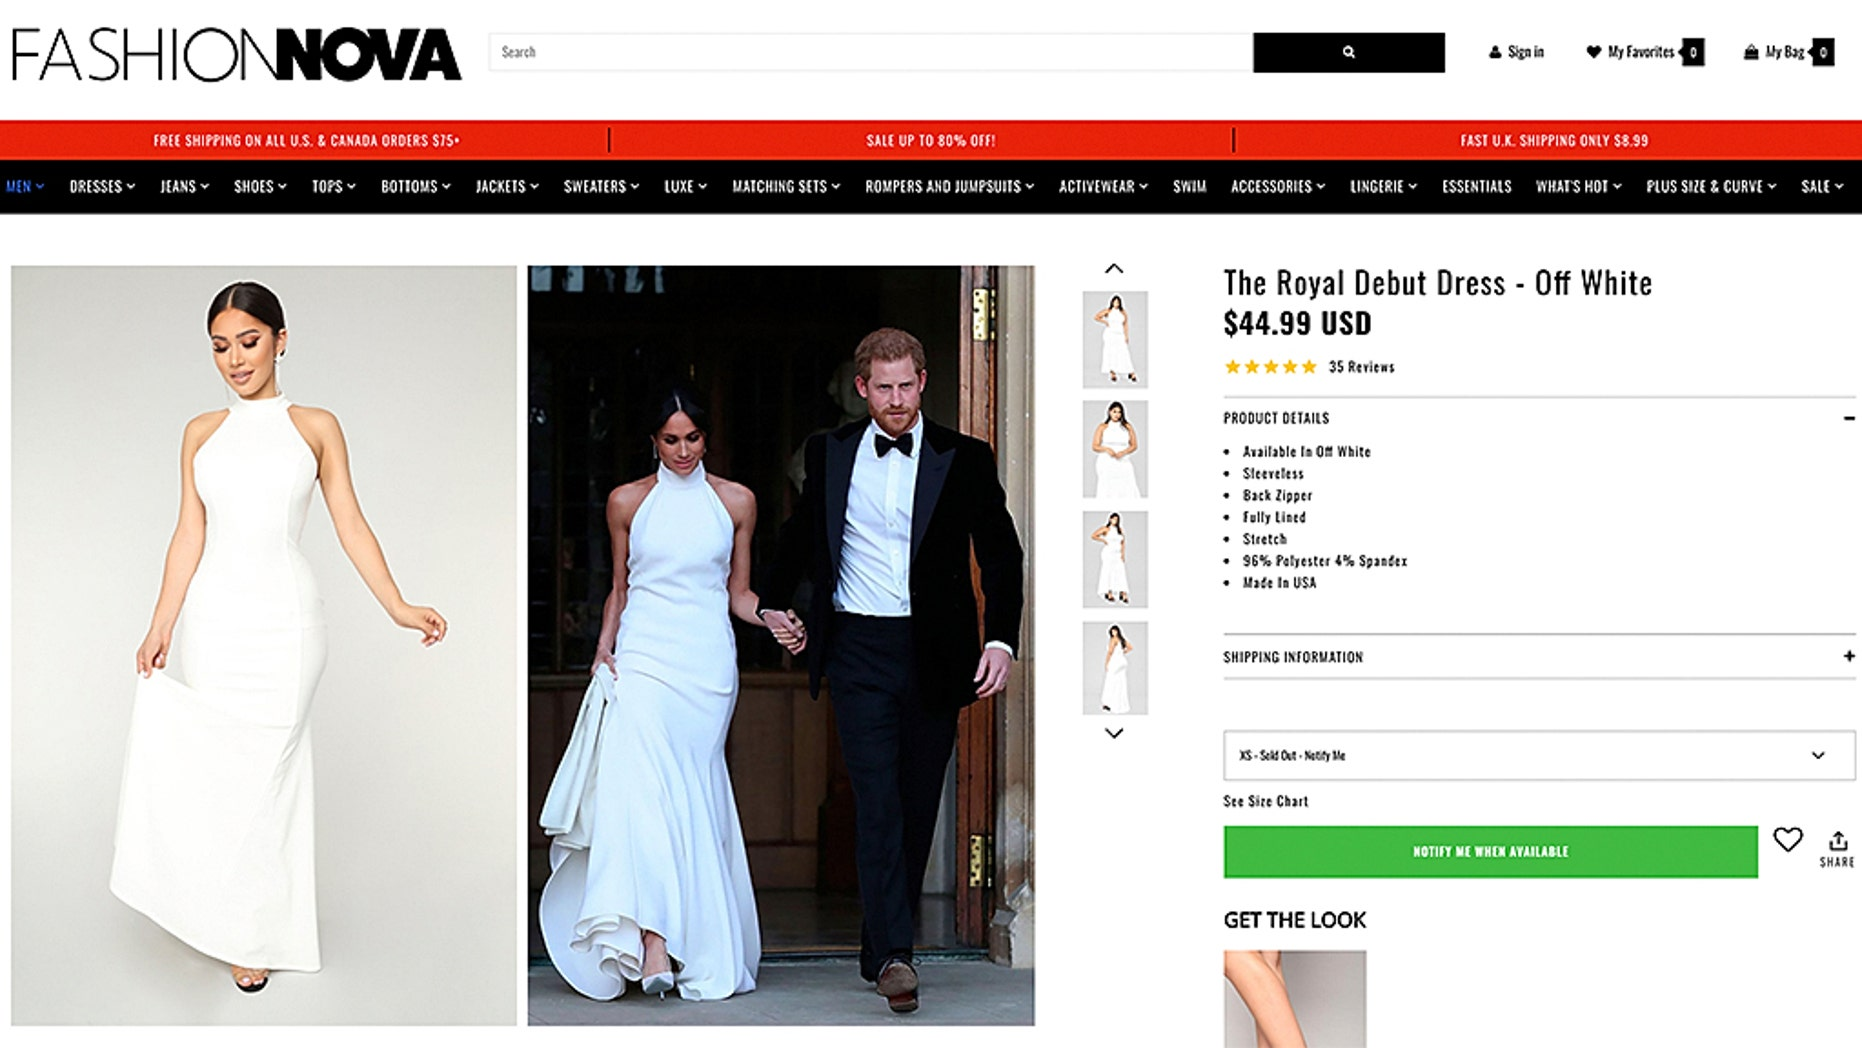 Fashion Site Releases 45 Meghan Markle Reception Dress Replica